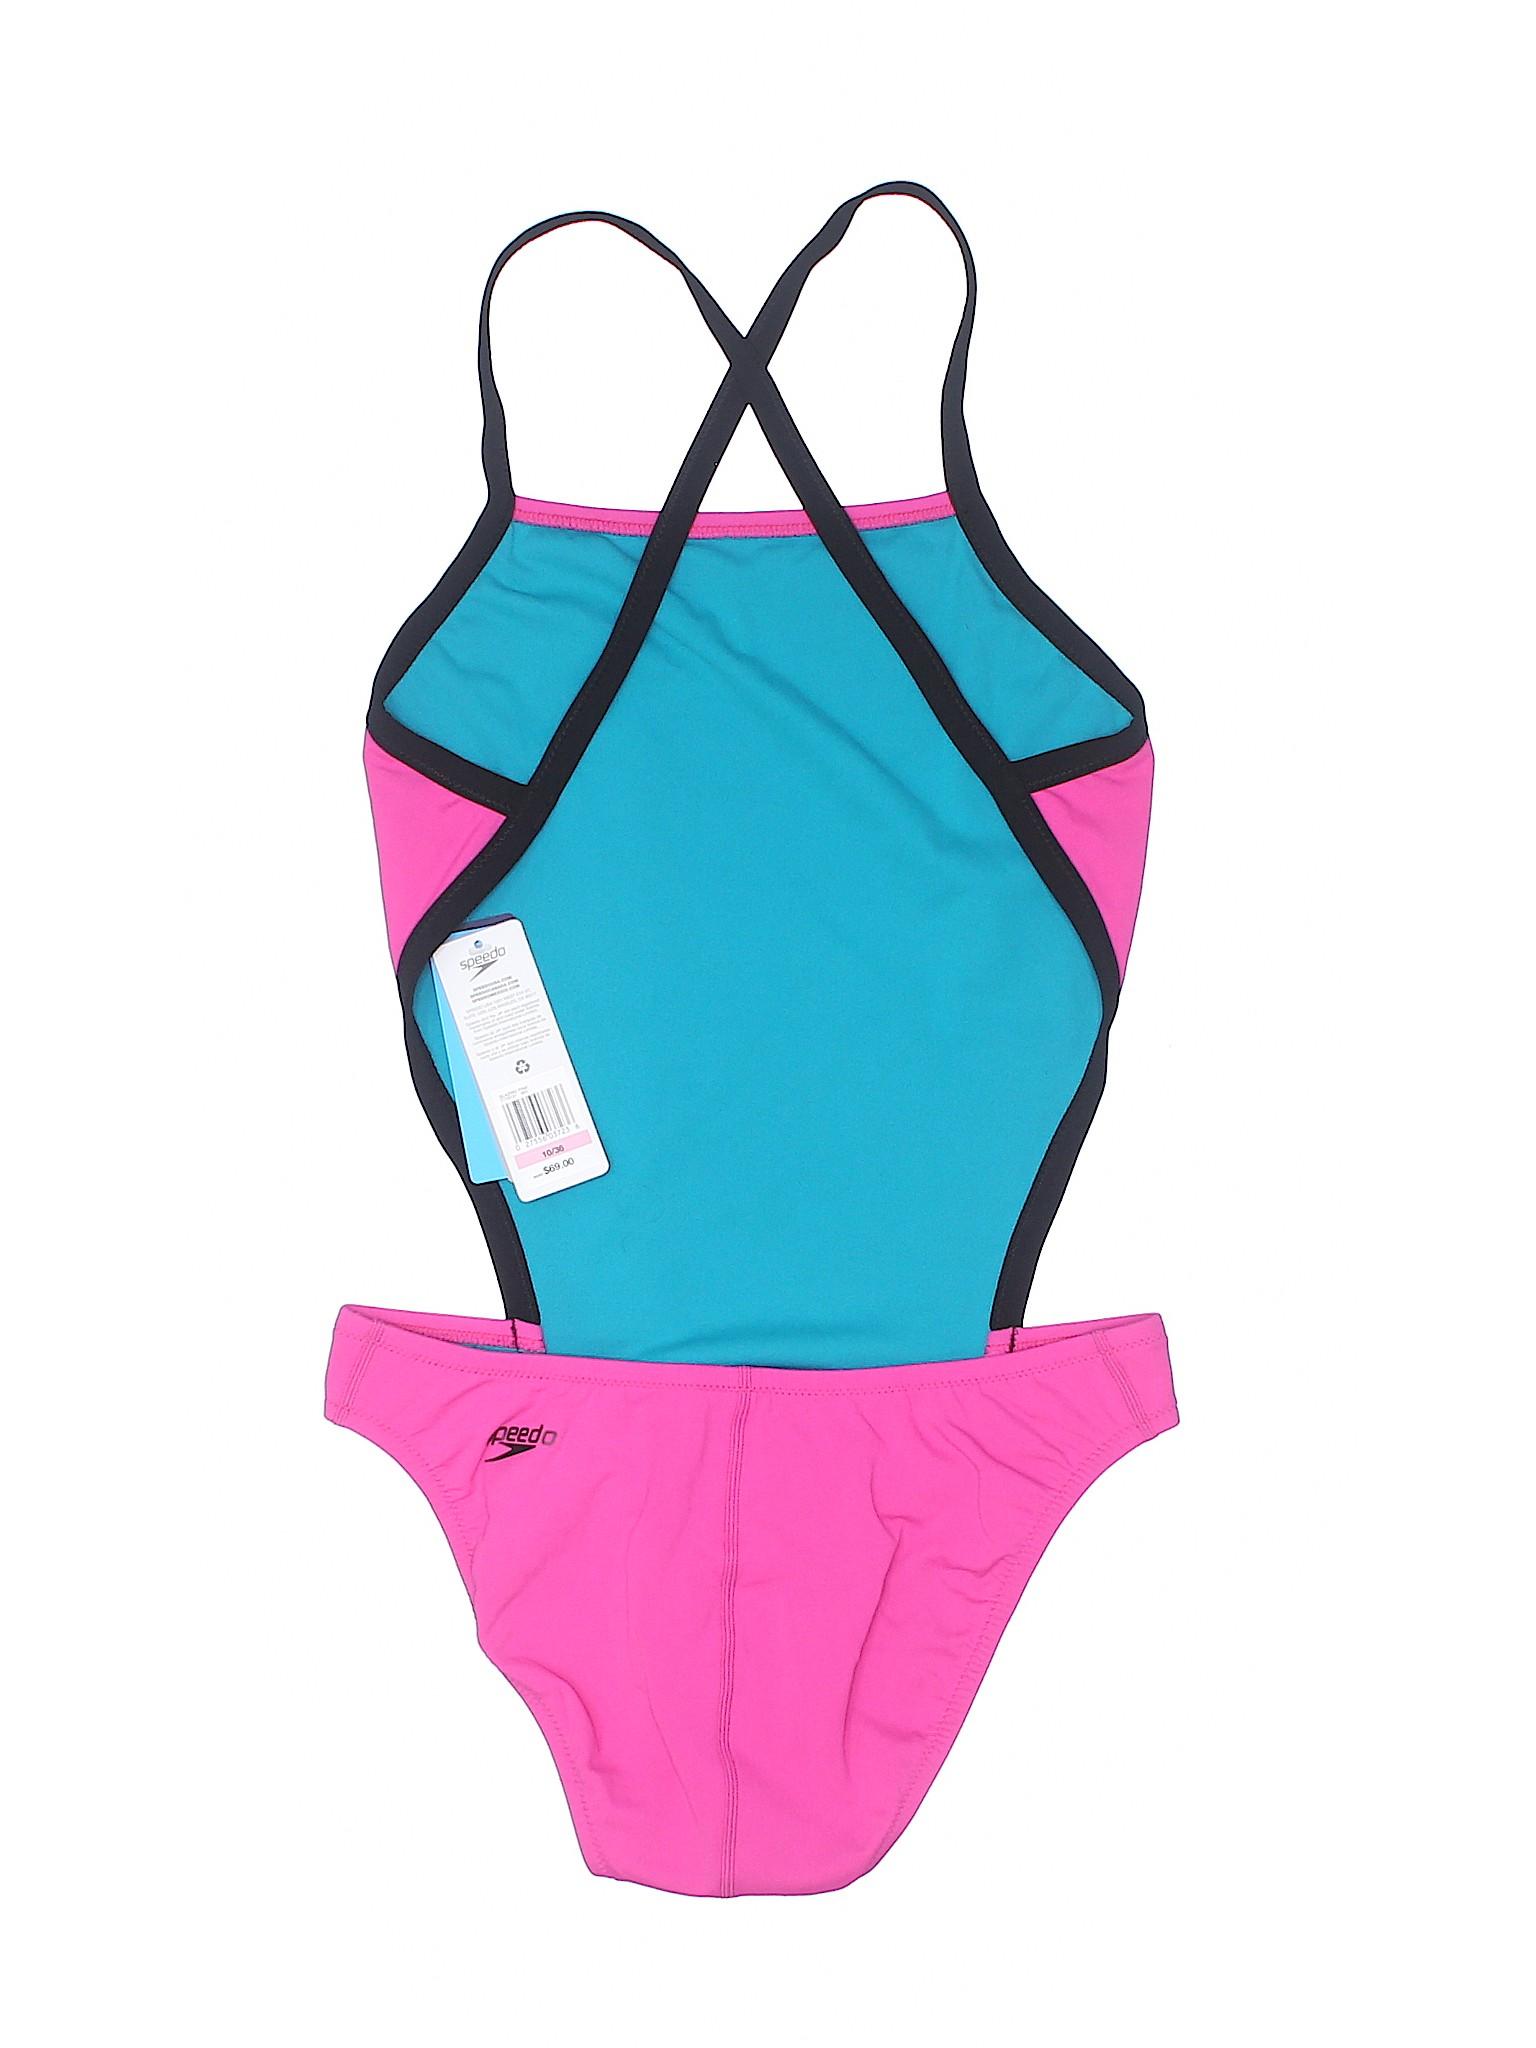 Swimsuit Boutique Piece Boutique Speedo Speedo One OUwpn6q